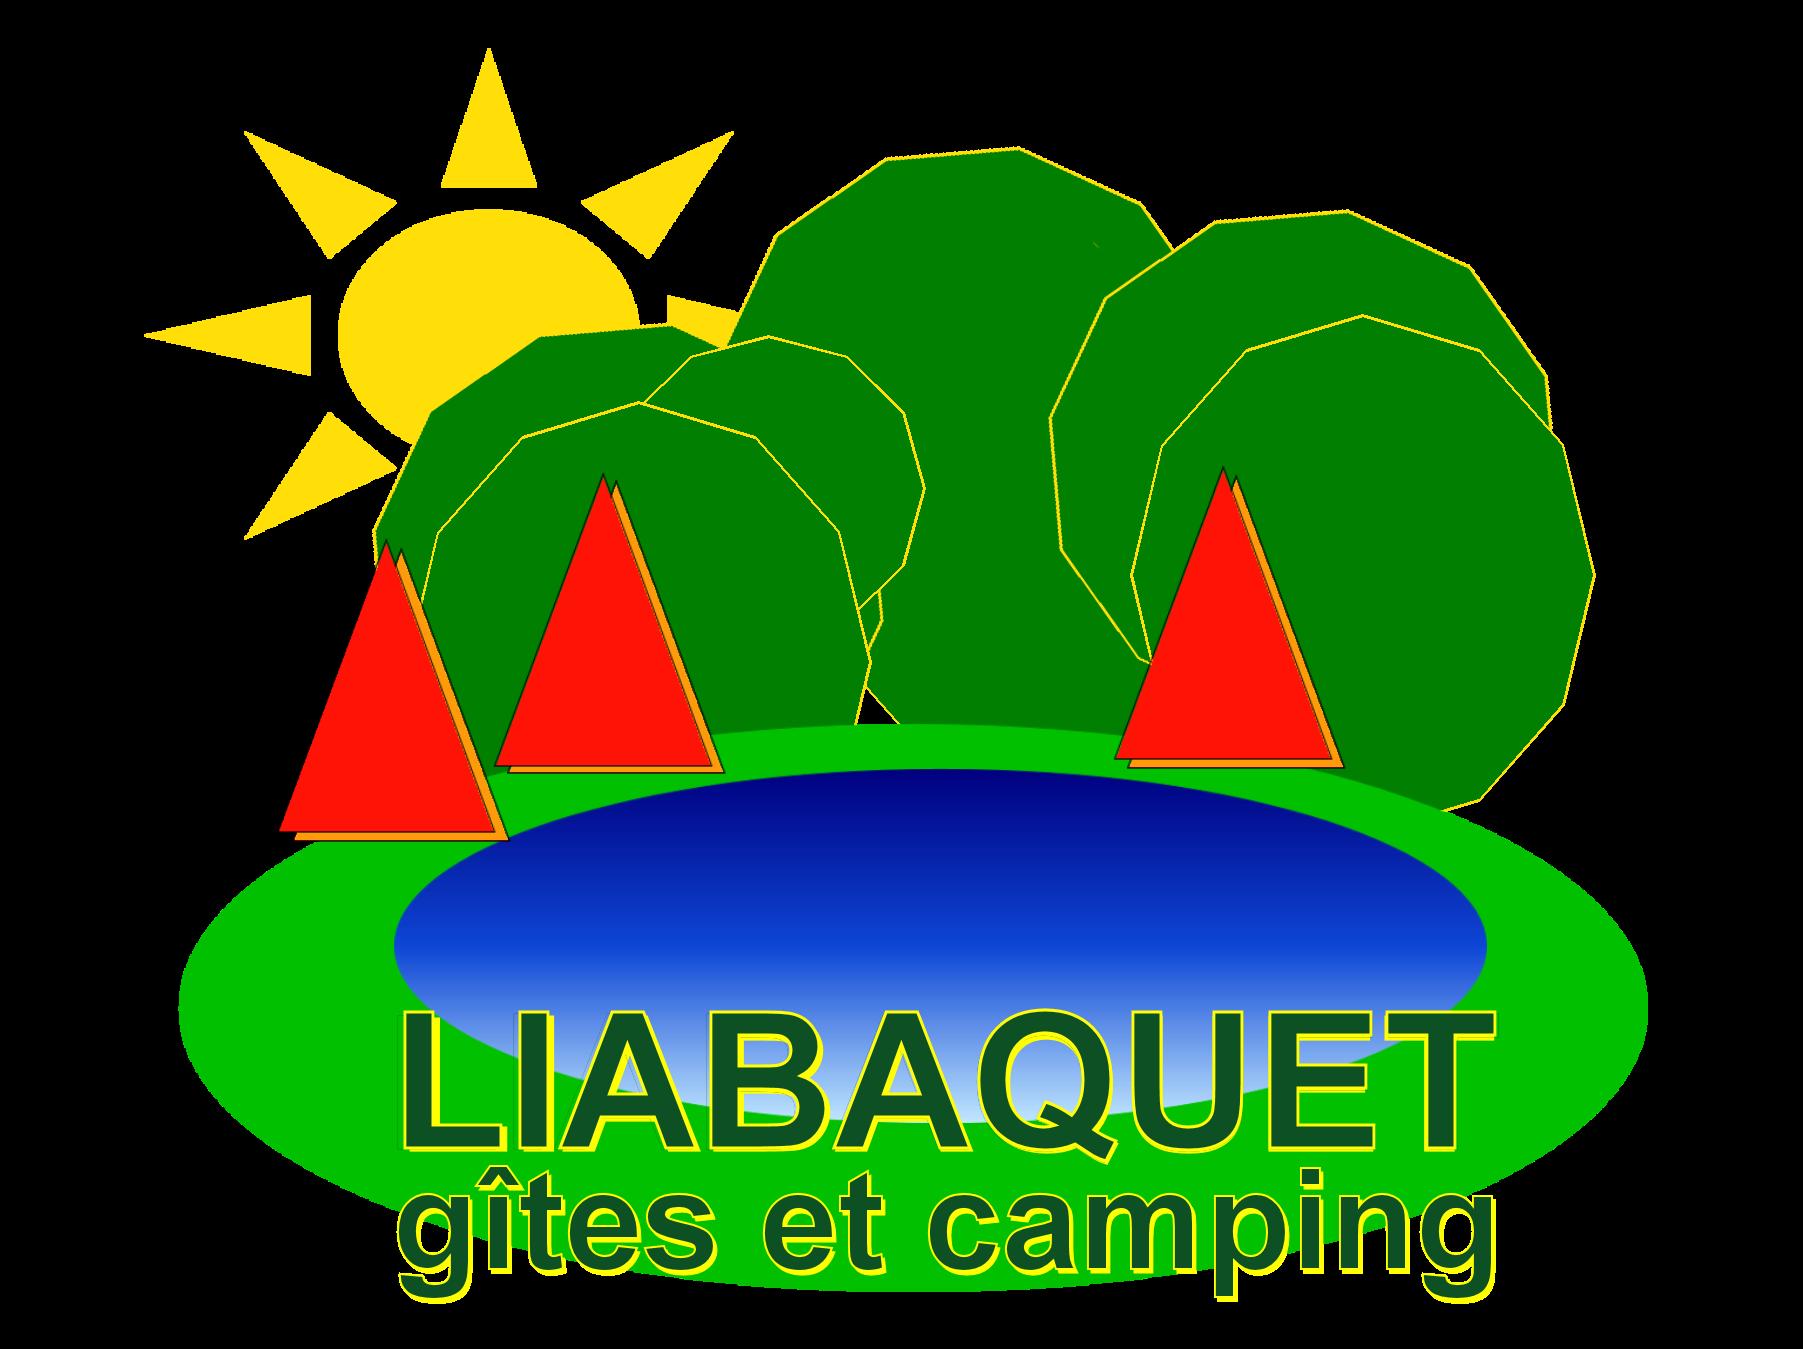 logo contact Liabaquet gîtes et camping, vakantiehuisje Sarlande, dordogne, Frankrijk